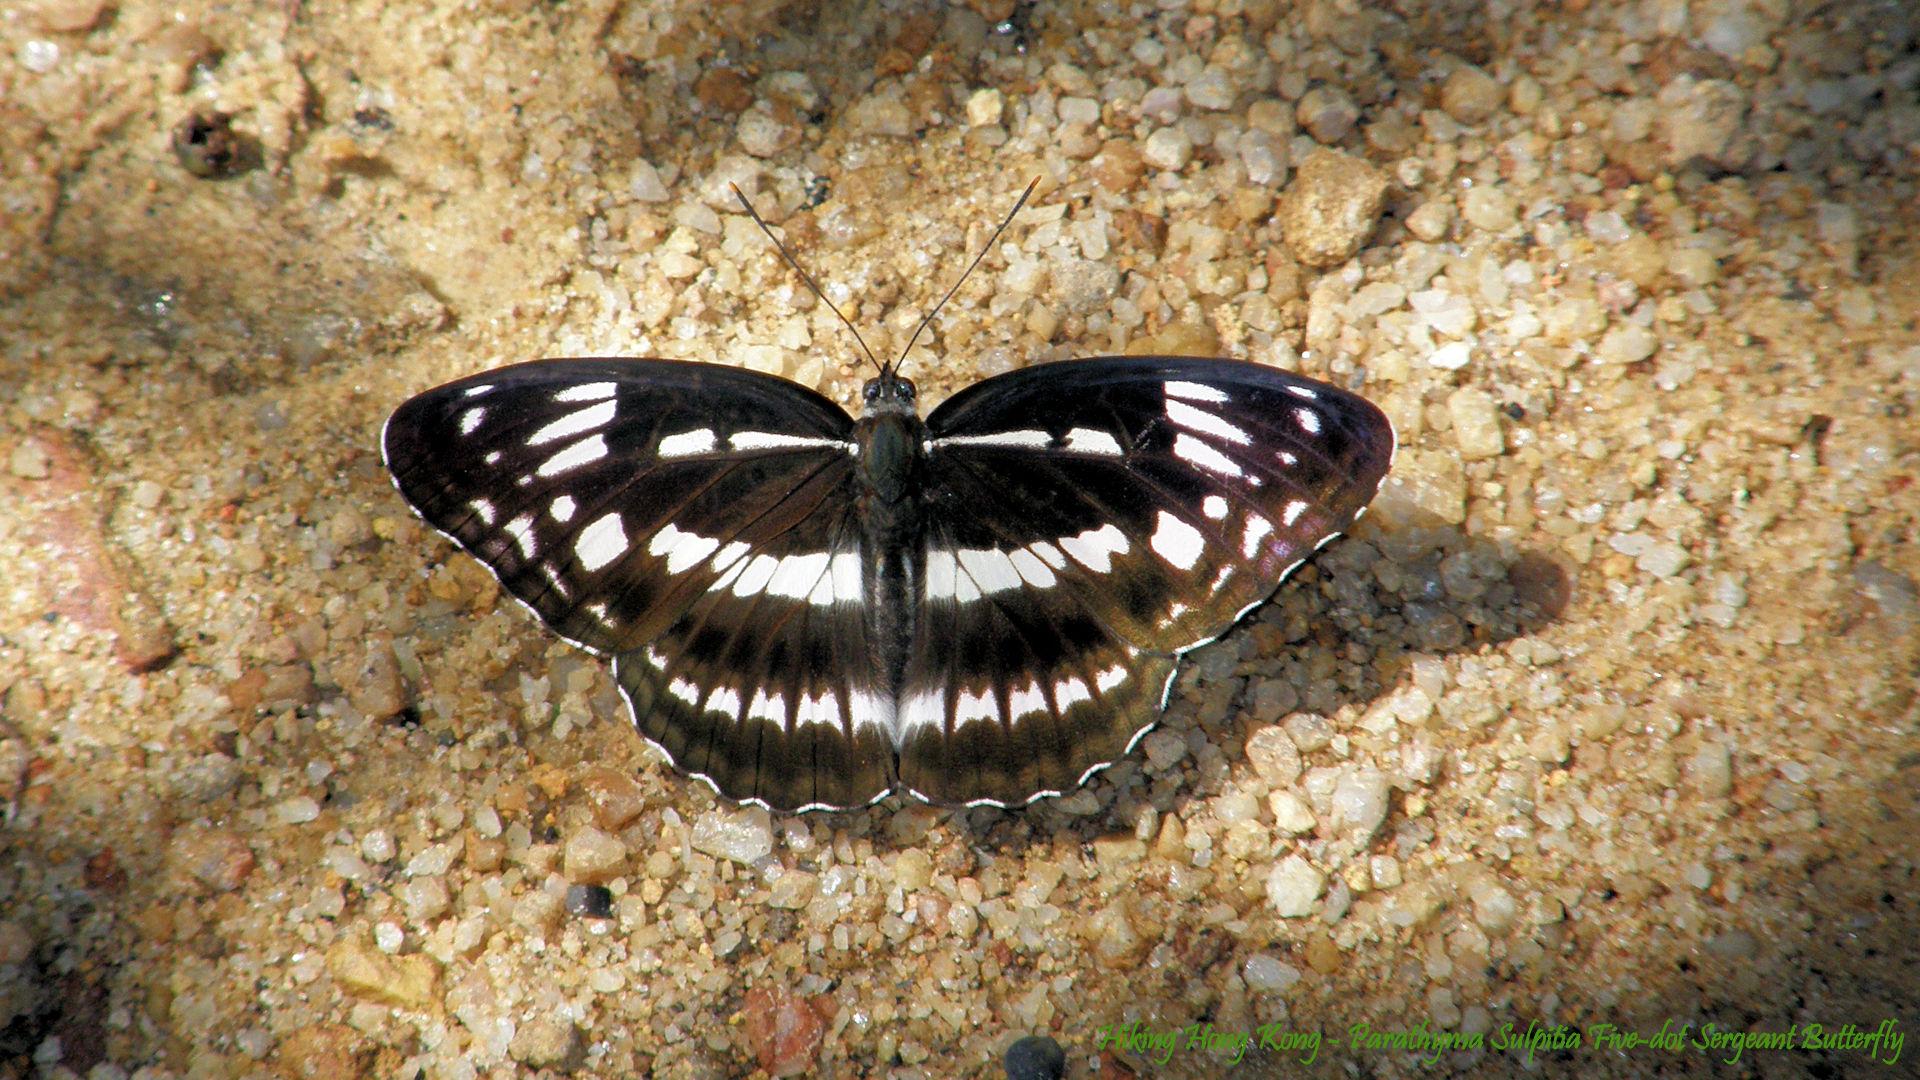 Hong-Kong-Butterfly-Parathyma-Sulpitia-Five-dot-Sergeant-Butterfly-Hiking-Hong-Kong-wallpaper-wpc5805984